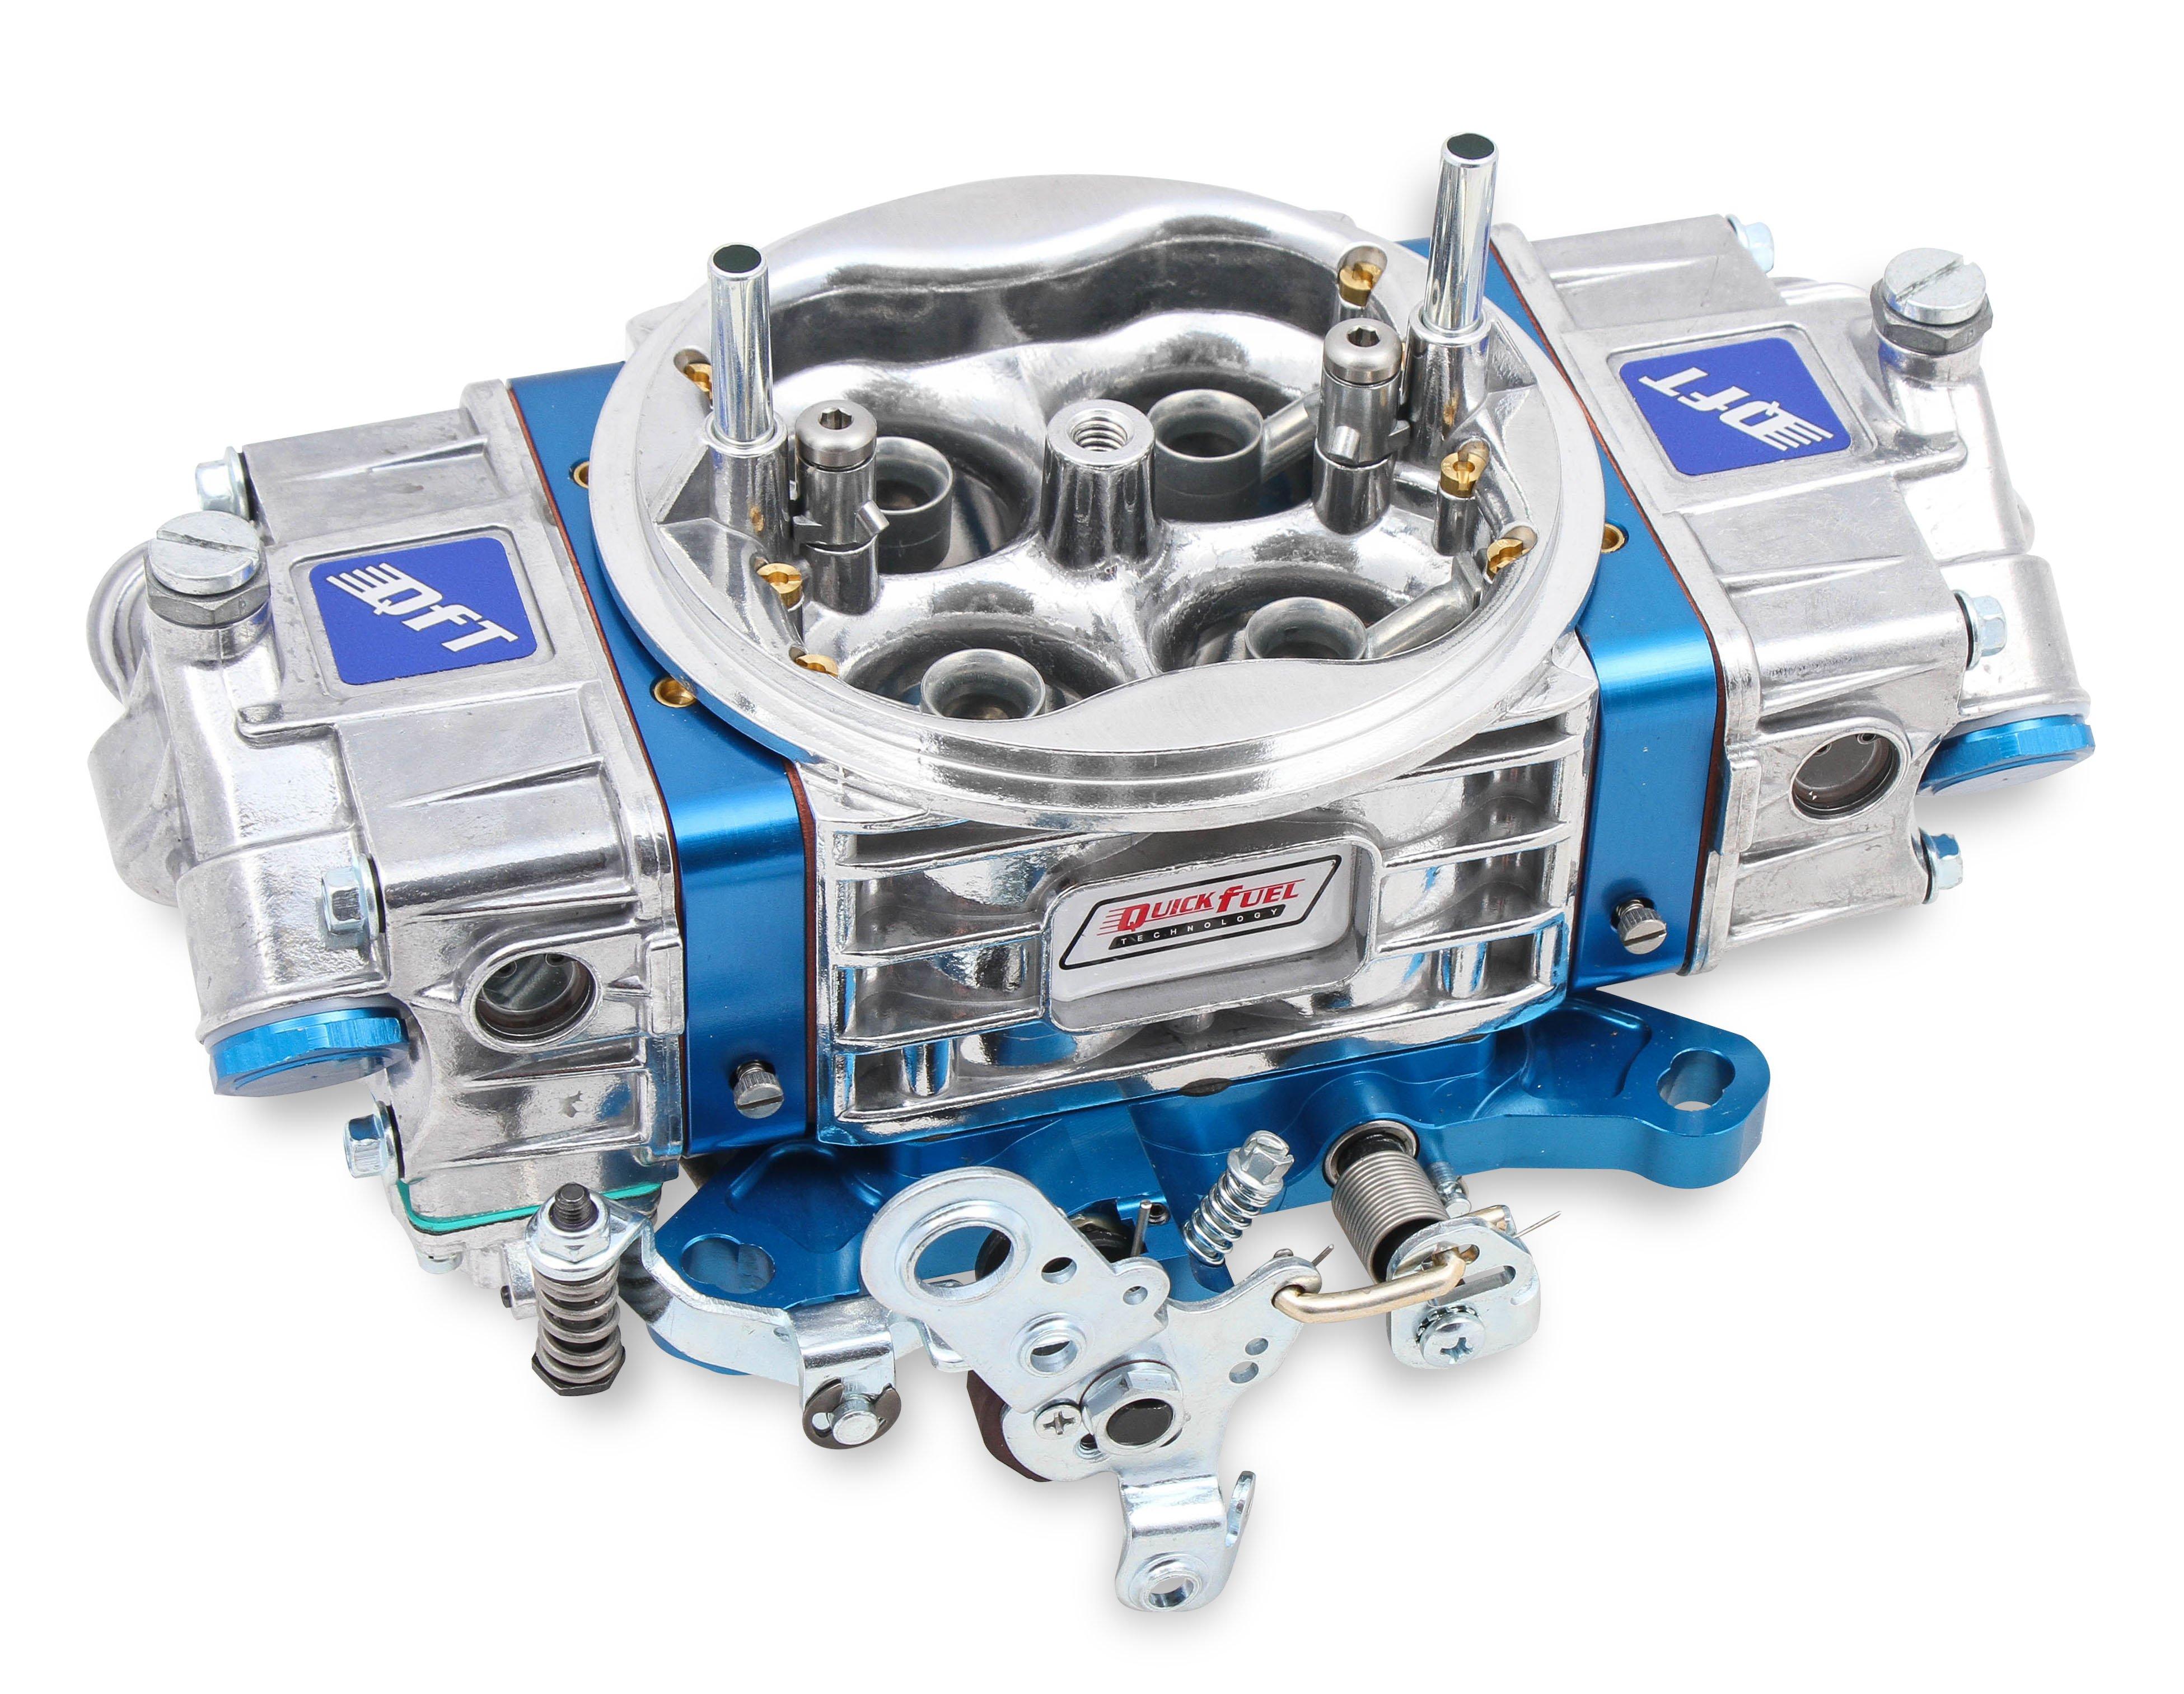 Q-Series Carburetor 750CFM Drag Race Alcohol